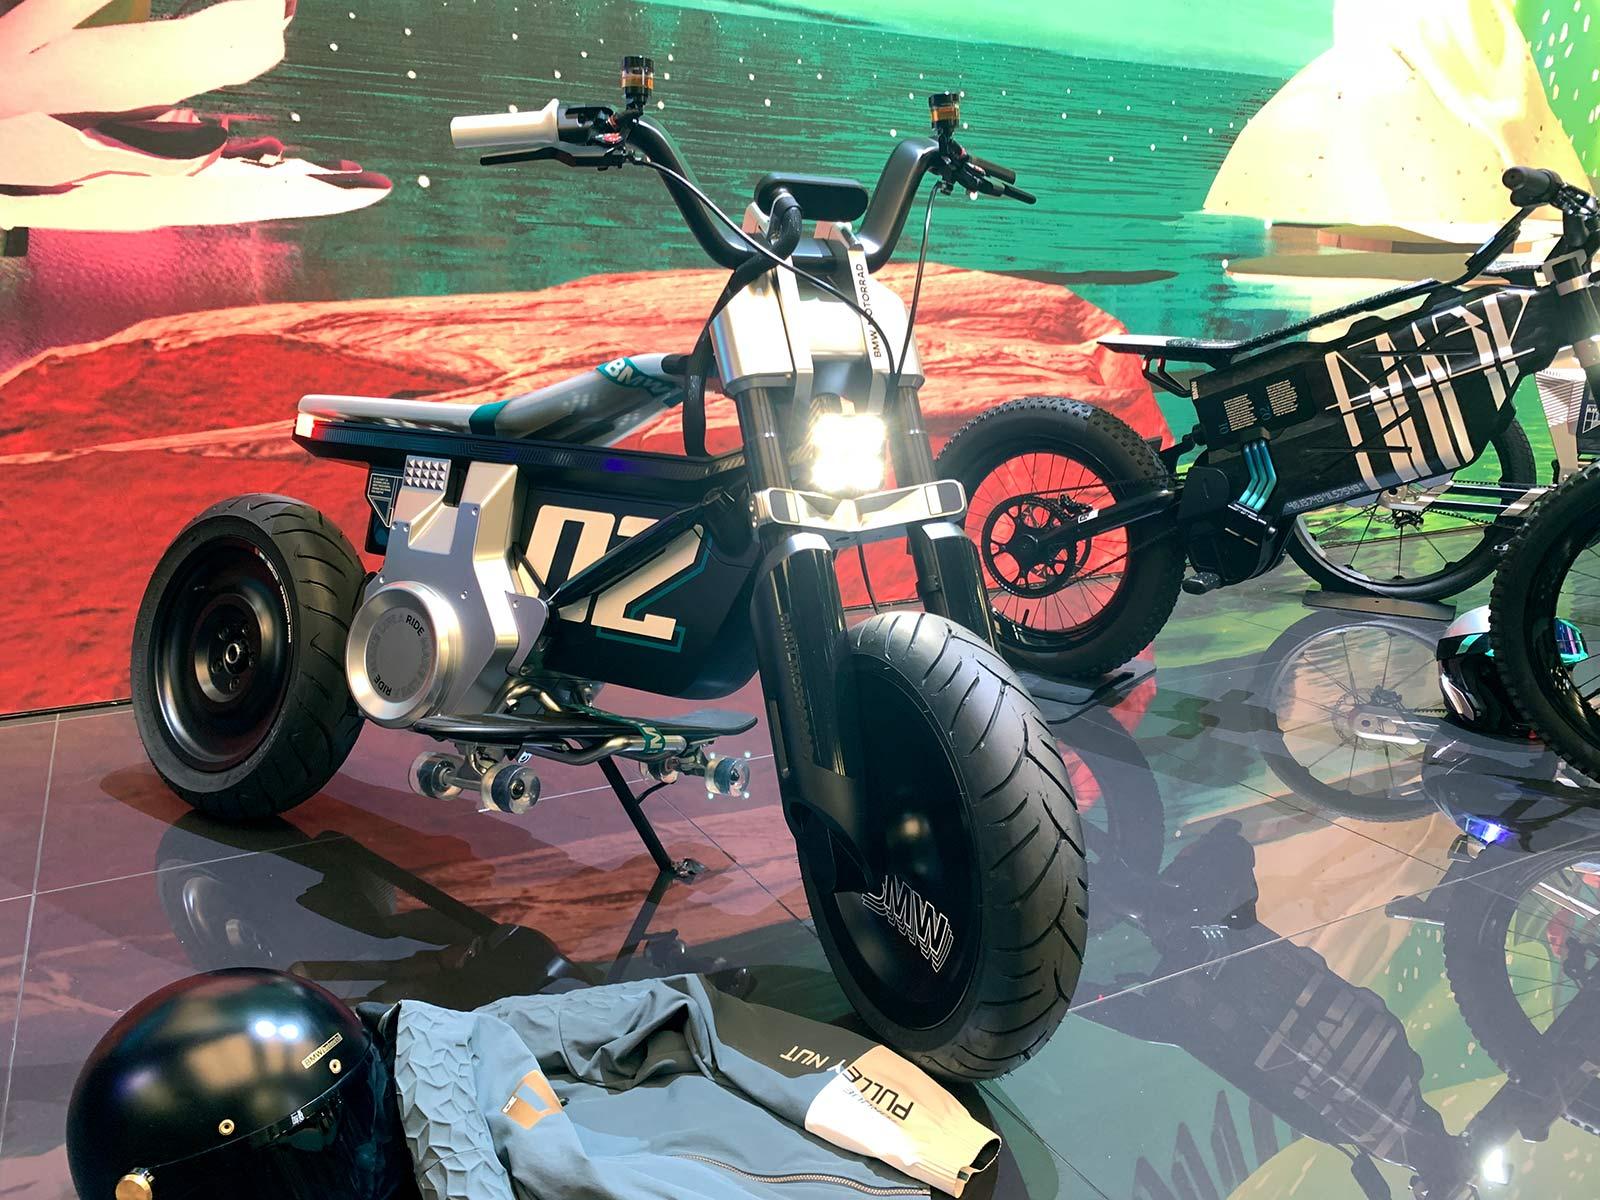 electric BMW motorad motorcycle concept